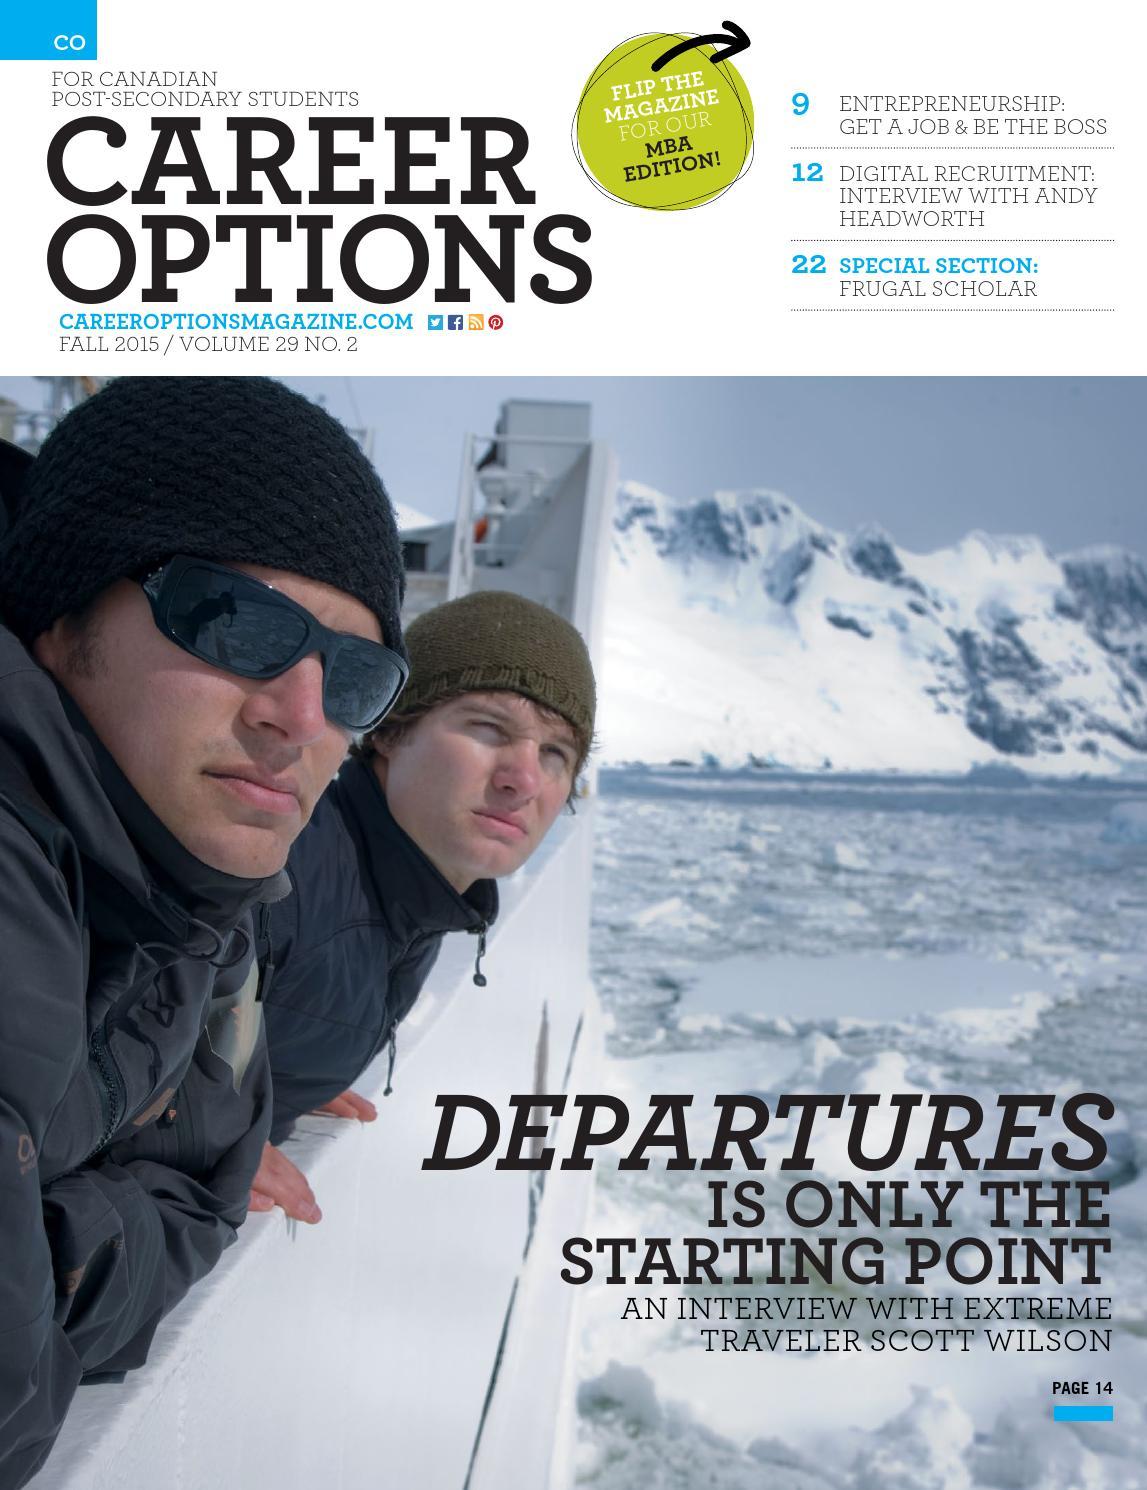 career options magazine schools co ps 2015